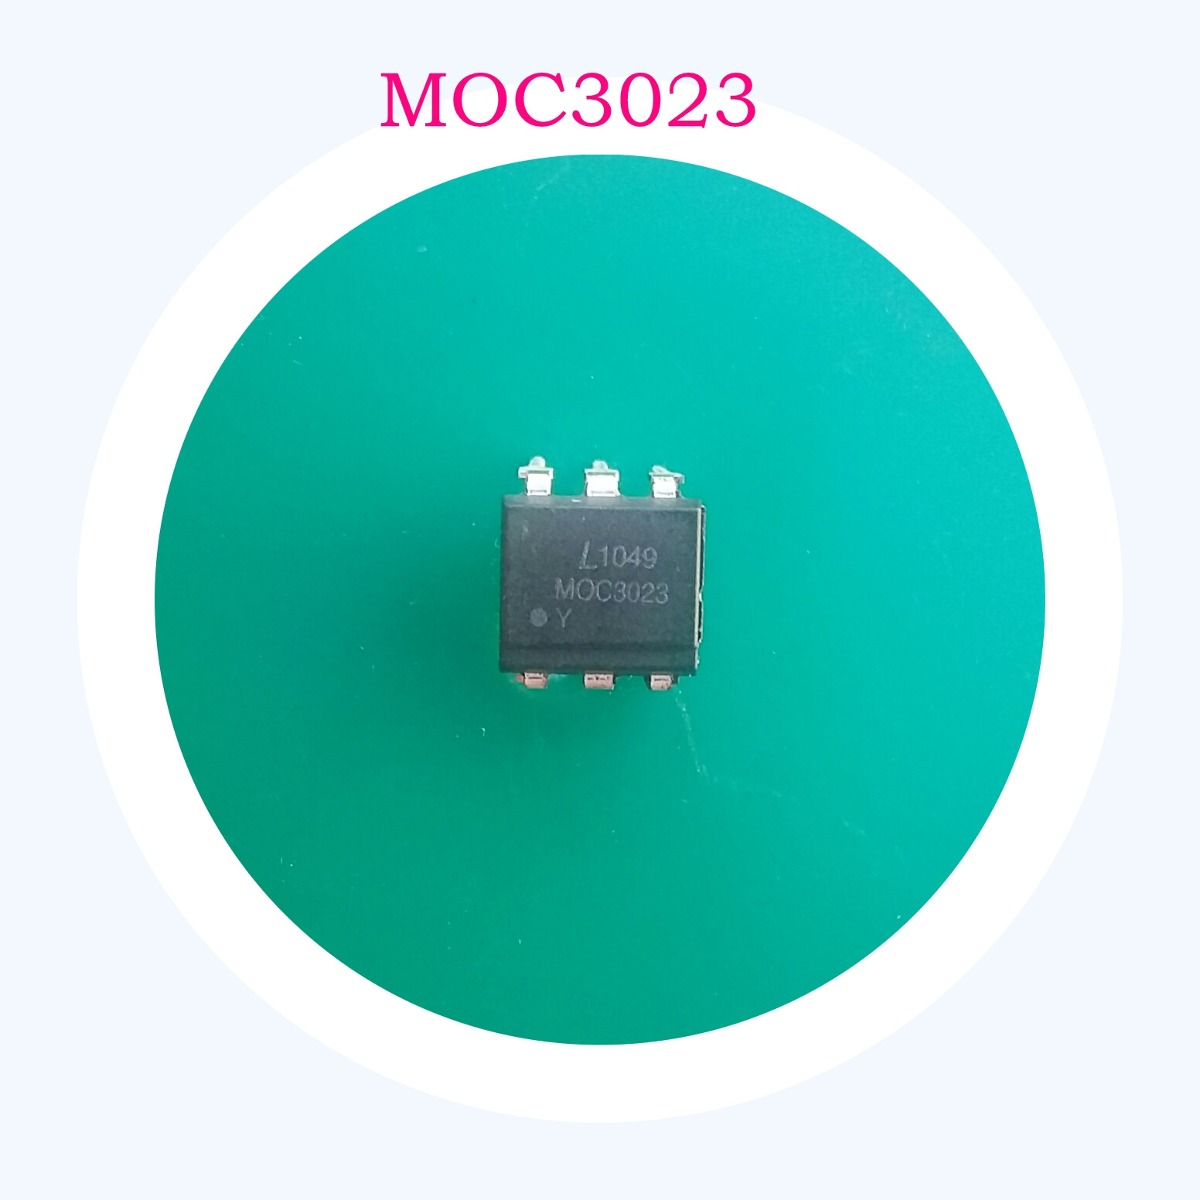 Circuito Optoacoplador : Moc3023 optoacoplador circuito integrado moc3023 r$ 1 99 em